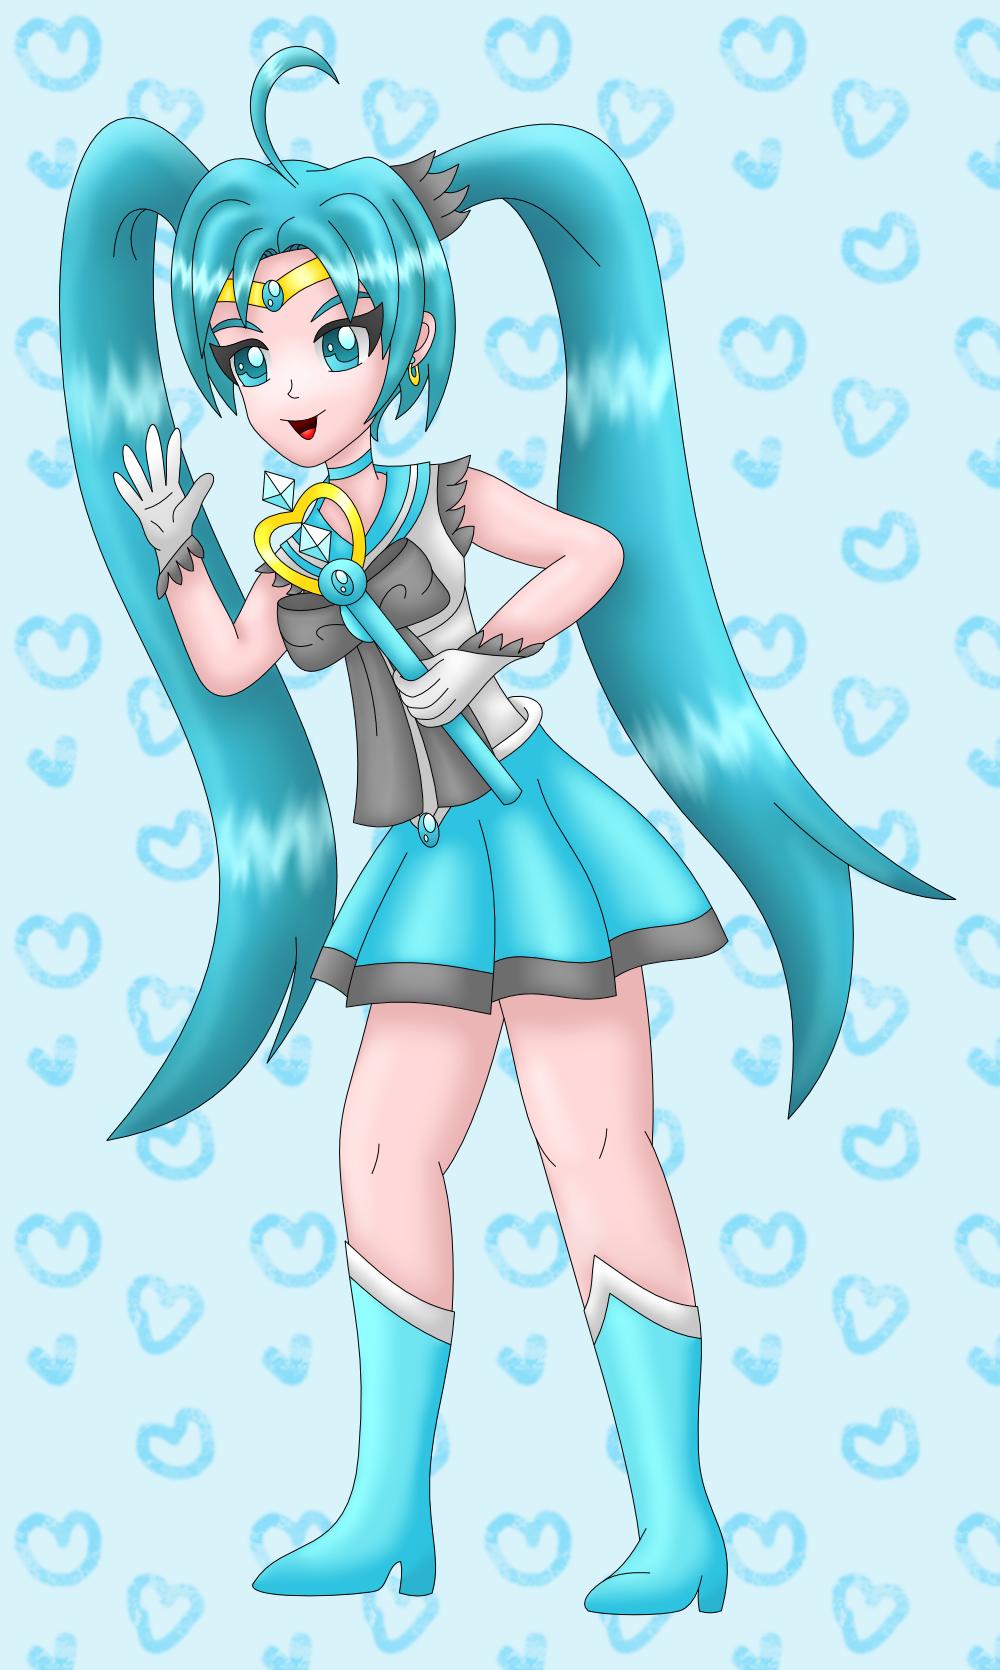 Sailor Miku colored by AzureMikari